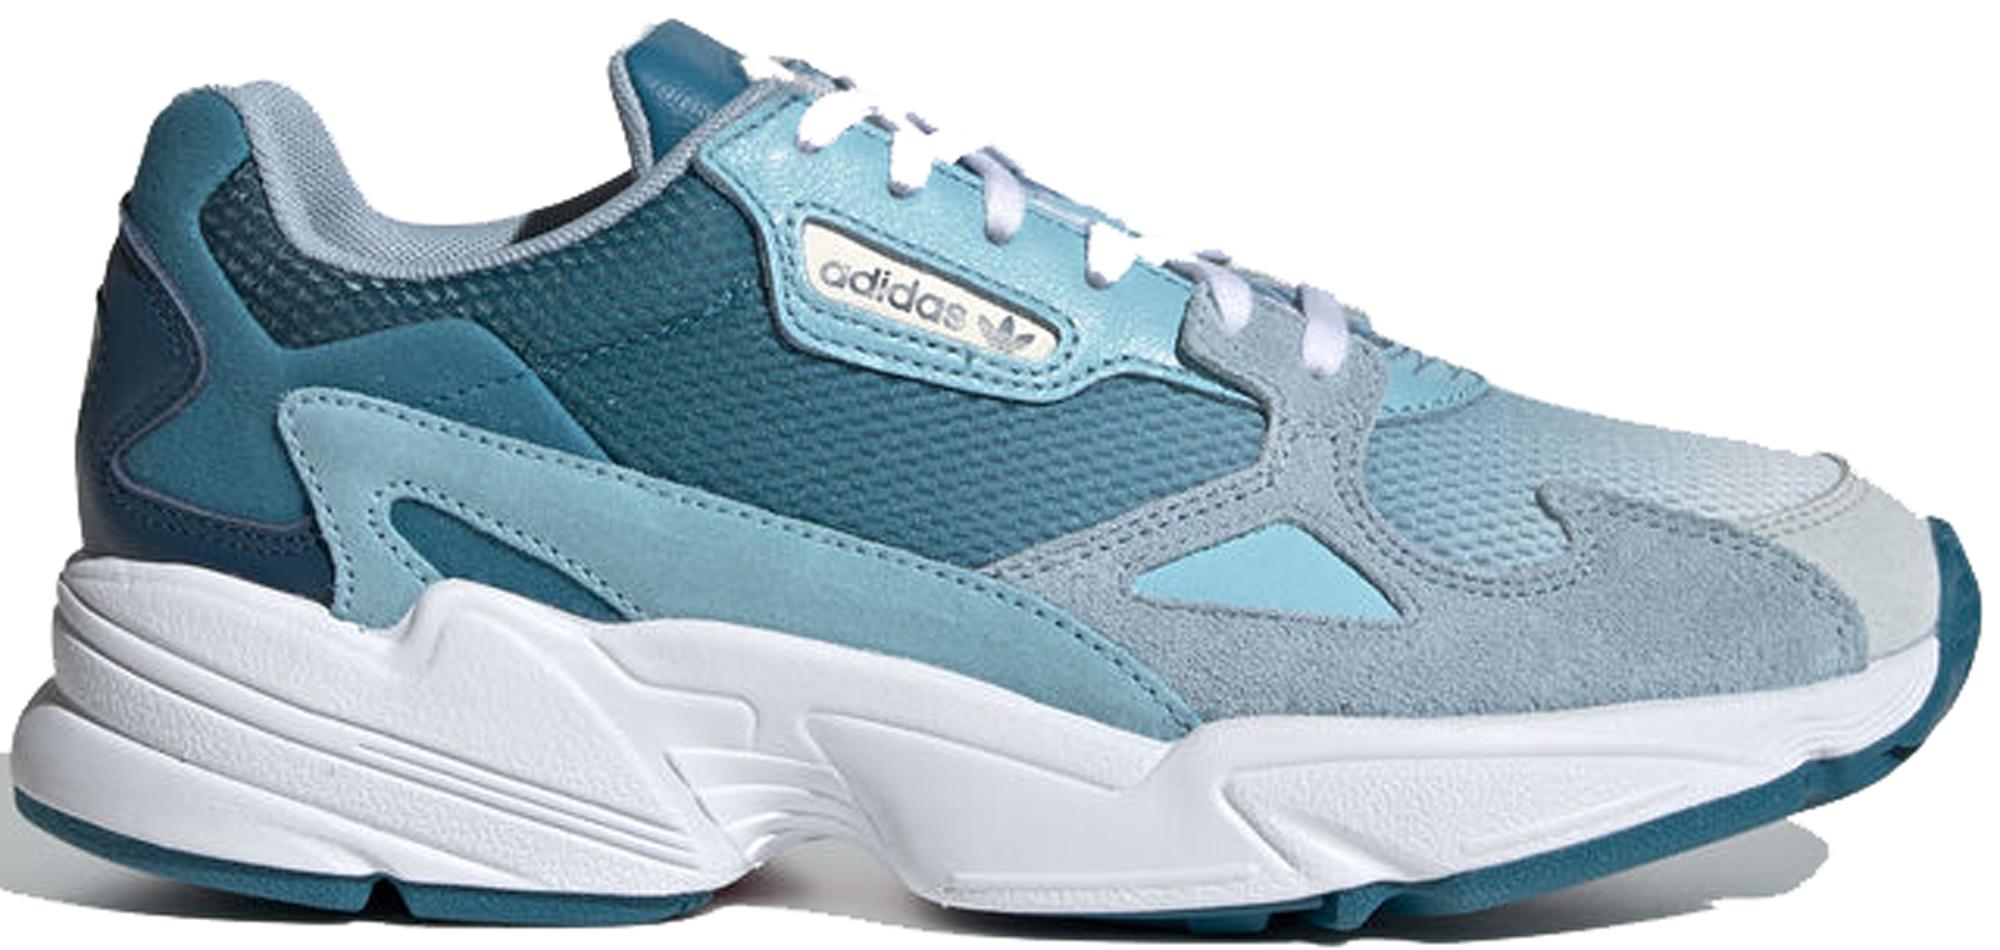 adidas Falcon Blue Tint Light Aqua (W